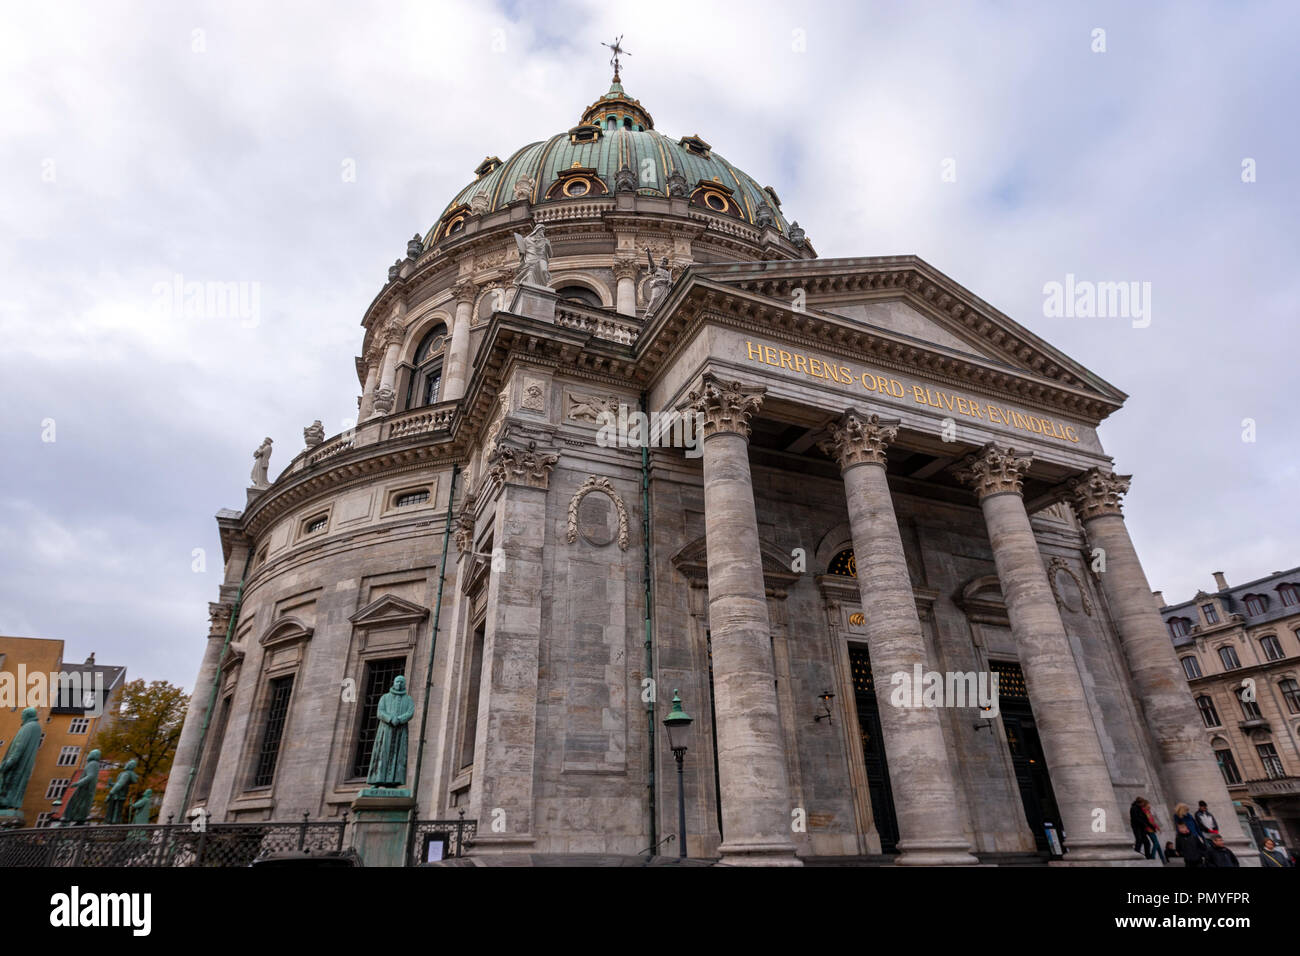 Frederik's Church Front entrance and dome Copenhagen, Denmark - Stock Image